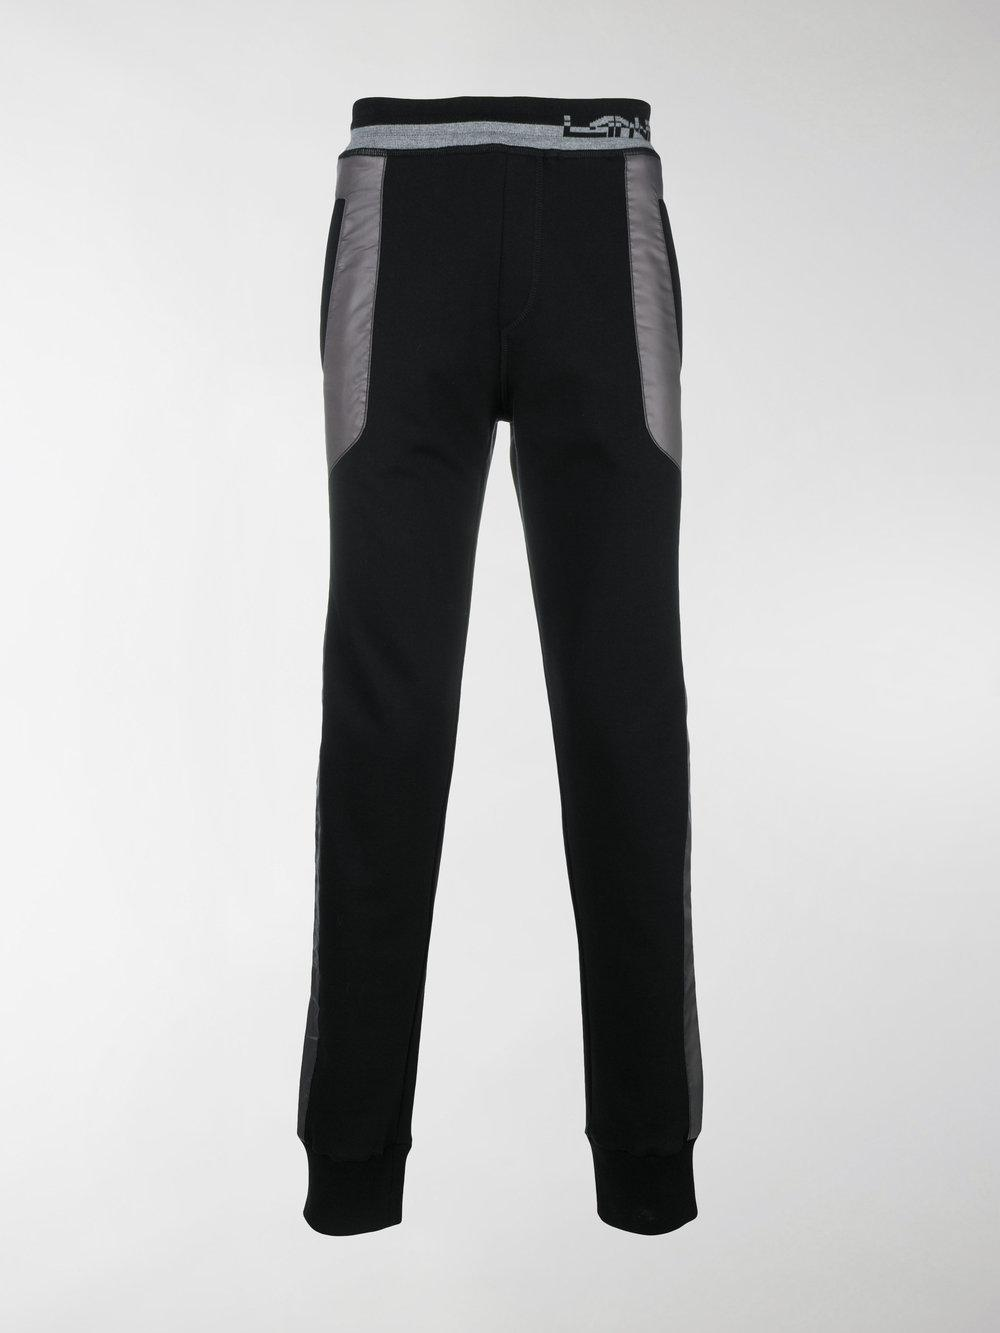 colour block track pants - Black Lanvin Free Shipping 2018 Buy Authentic Online paU6qywgho